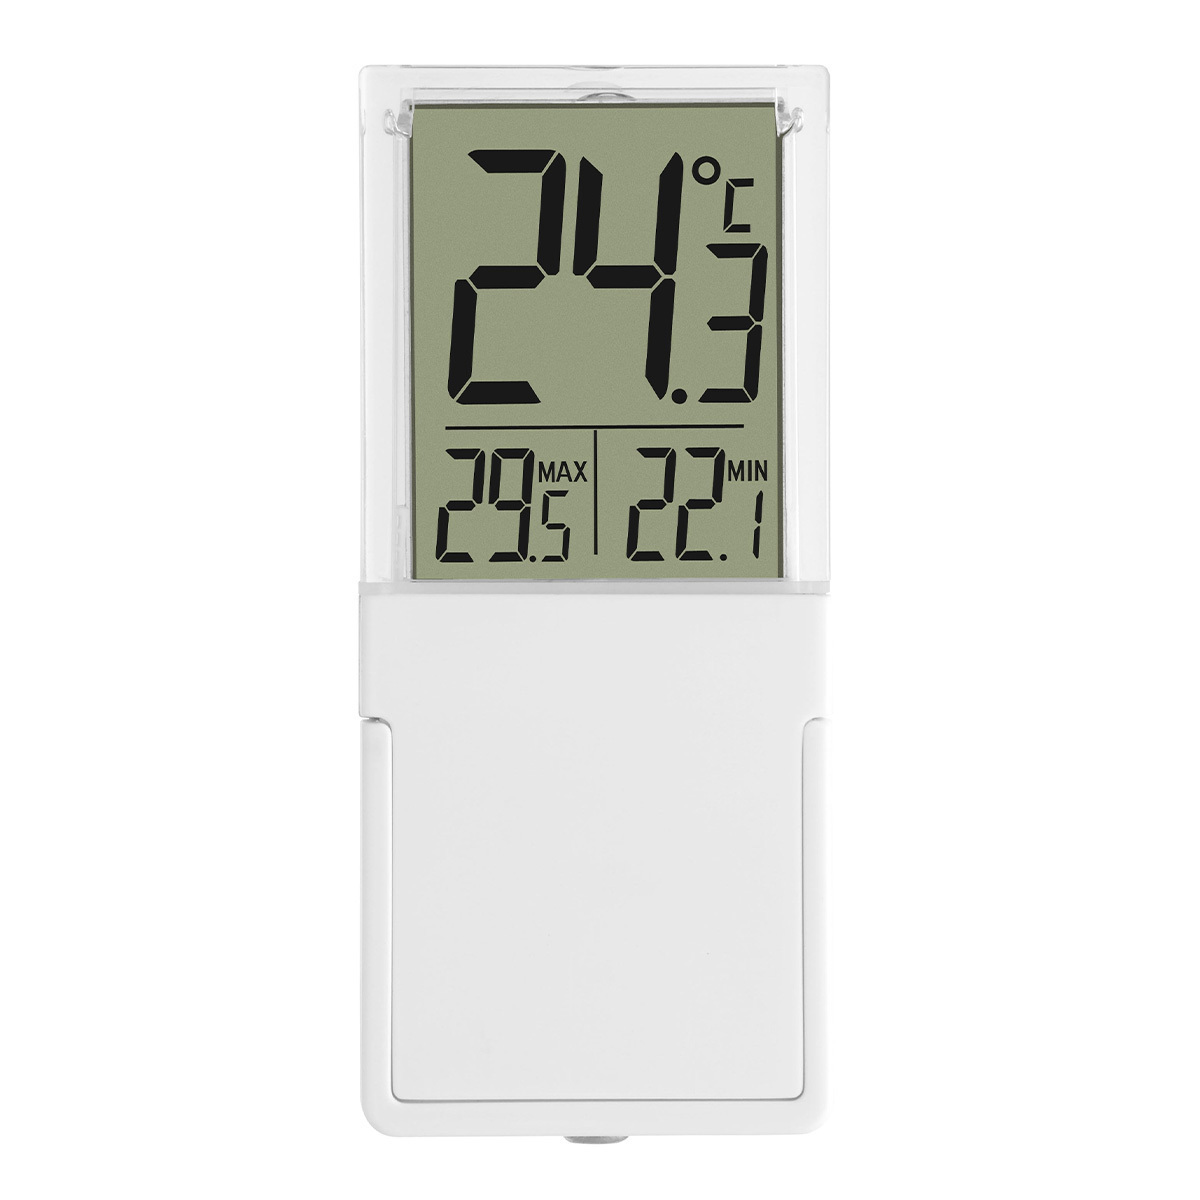 30-1030-digitales-fenster-innenthermometer-vista-1200x1200px.jpg